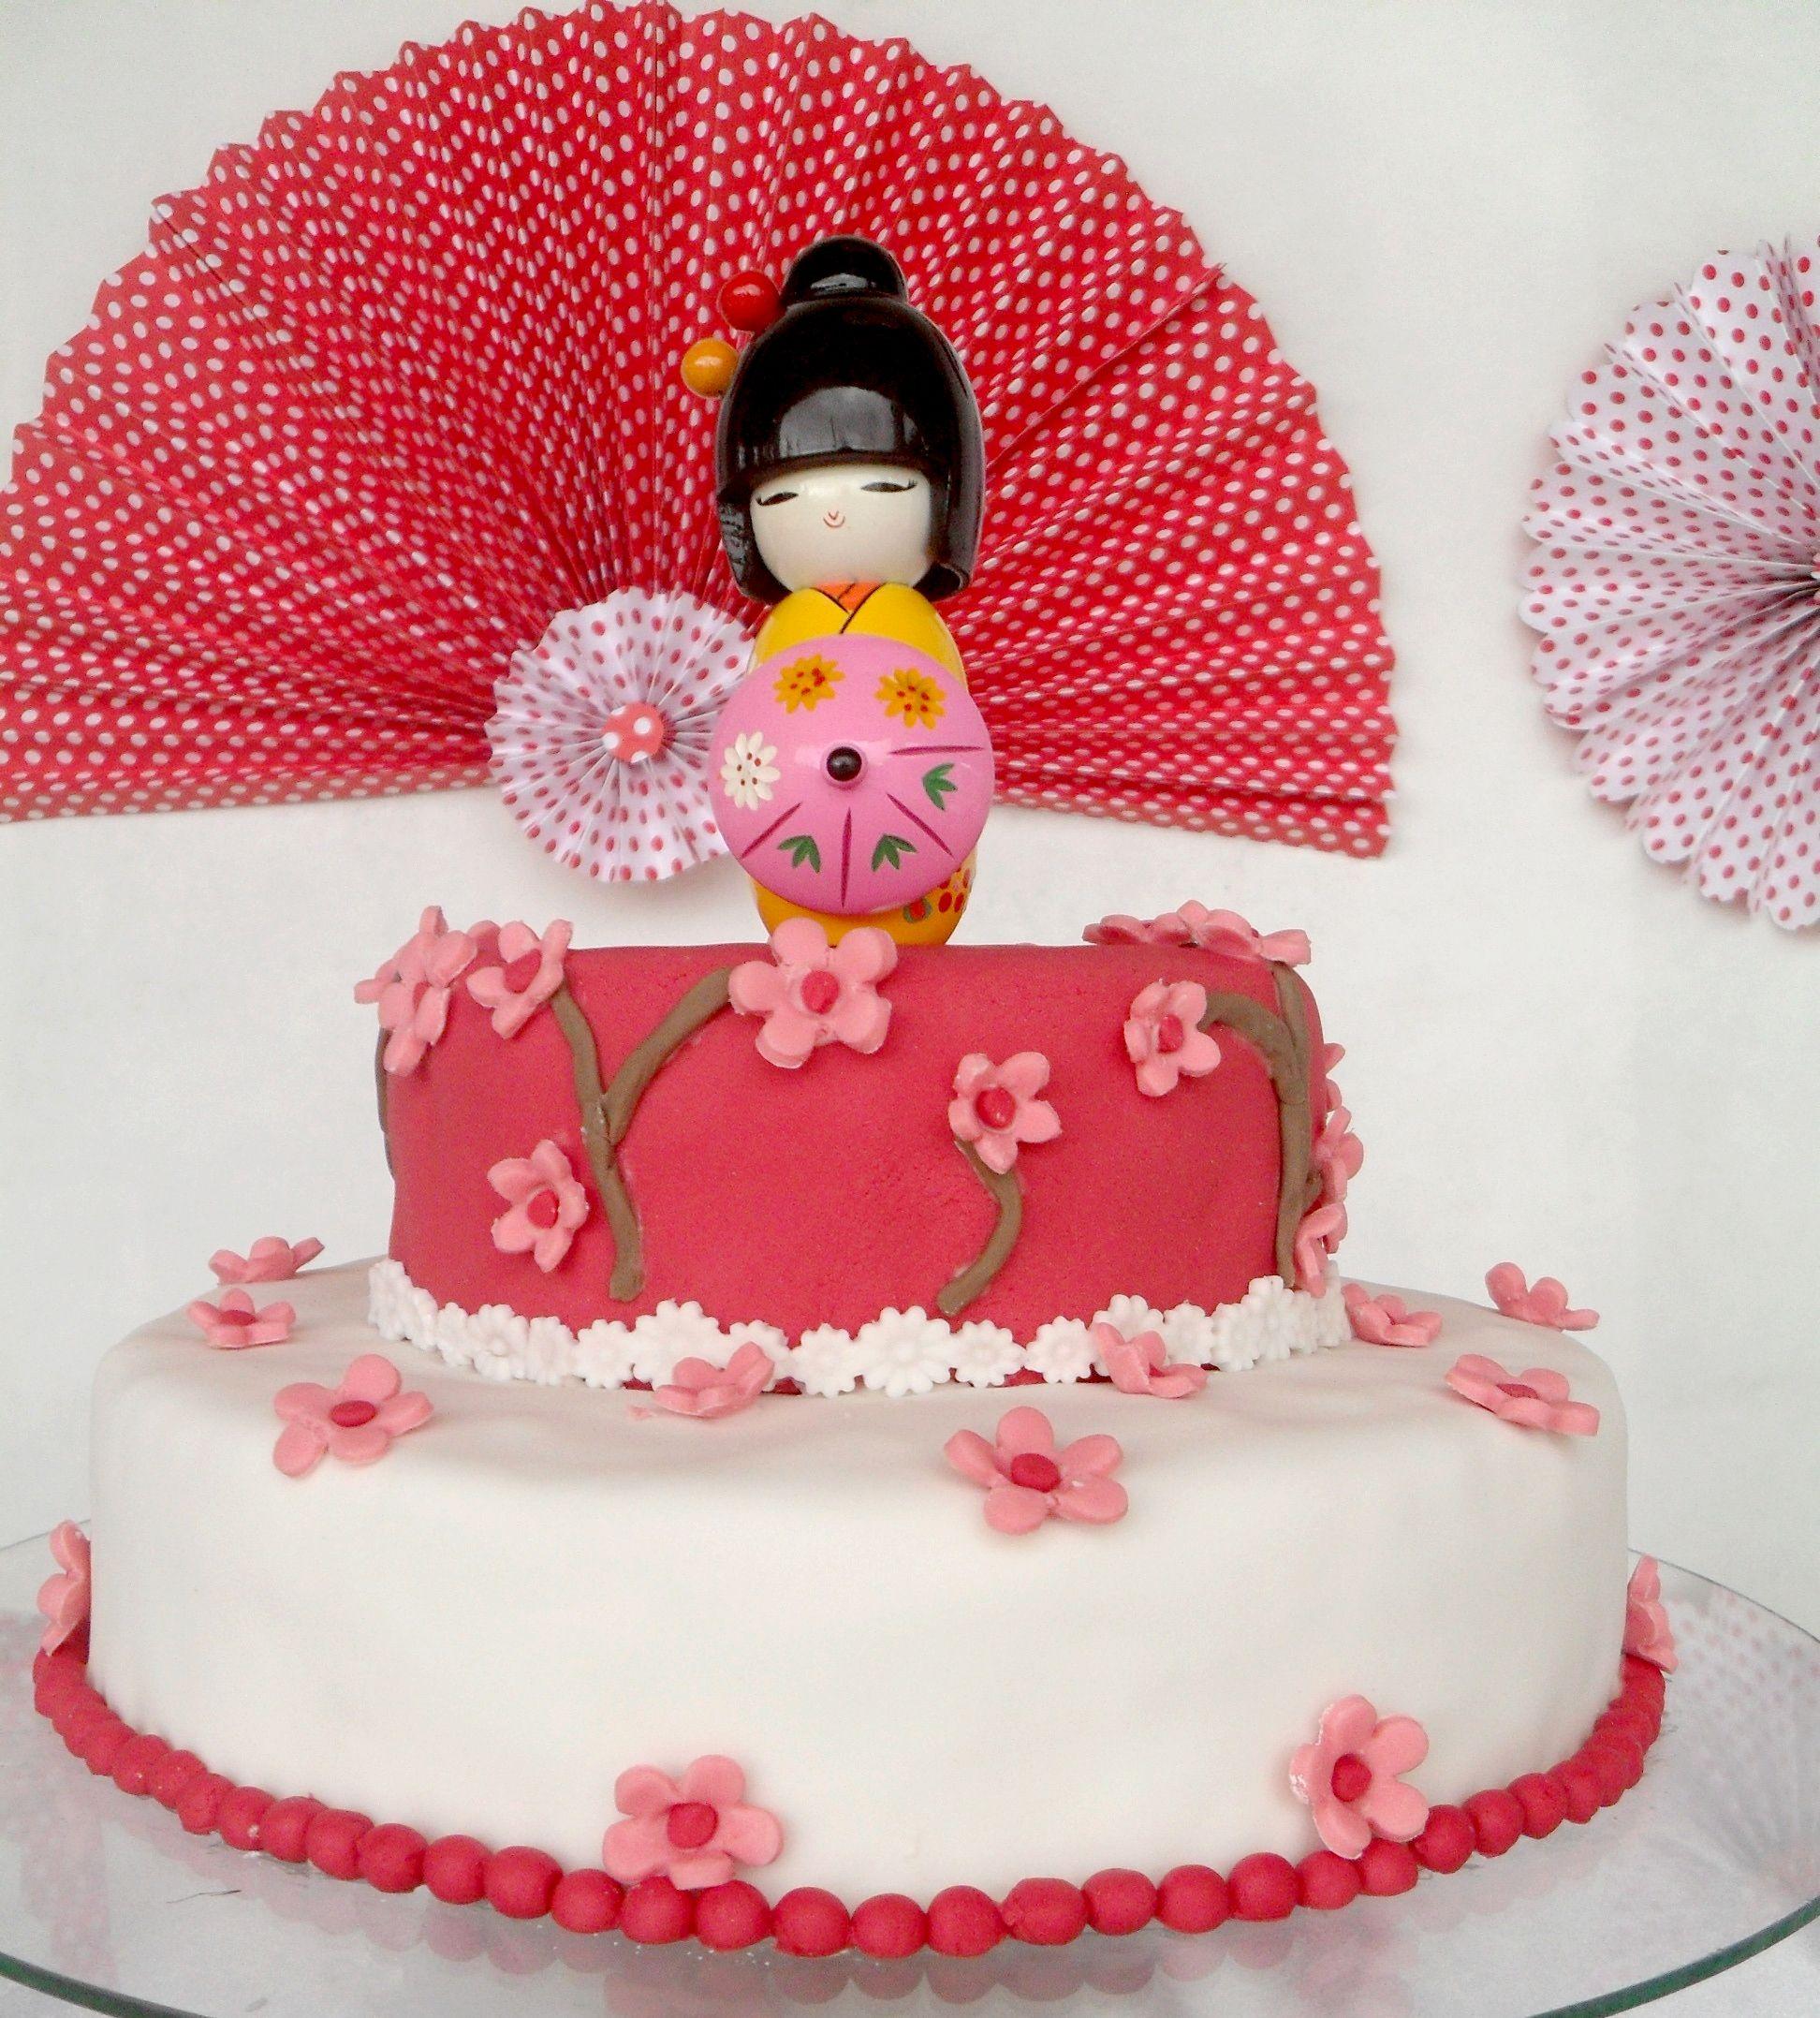 Awesome Japanese Cake My Birthday Con Imagenes Torta De Funny Birthday Cards Online Inifofree Goldxyz